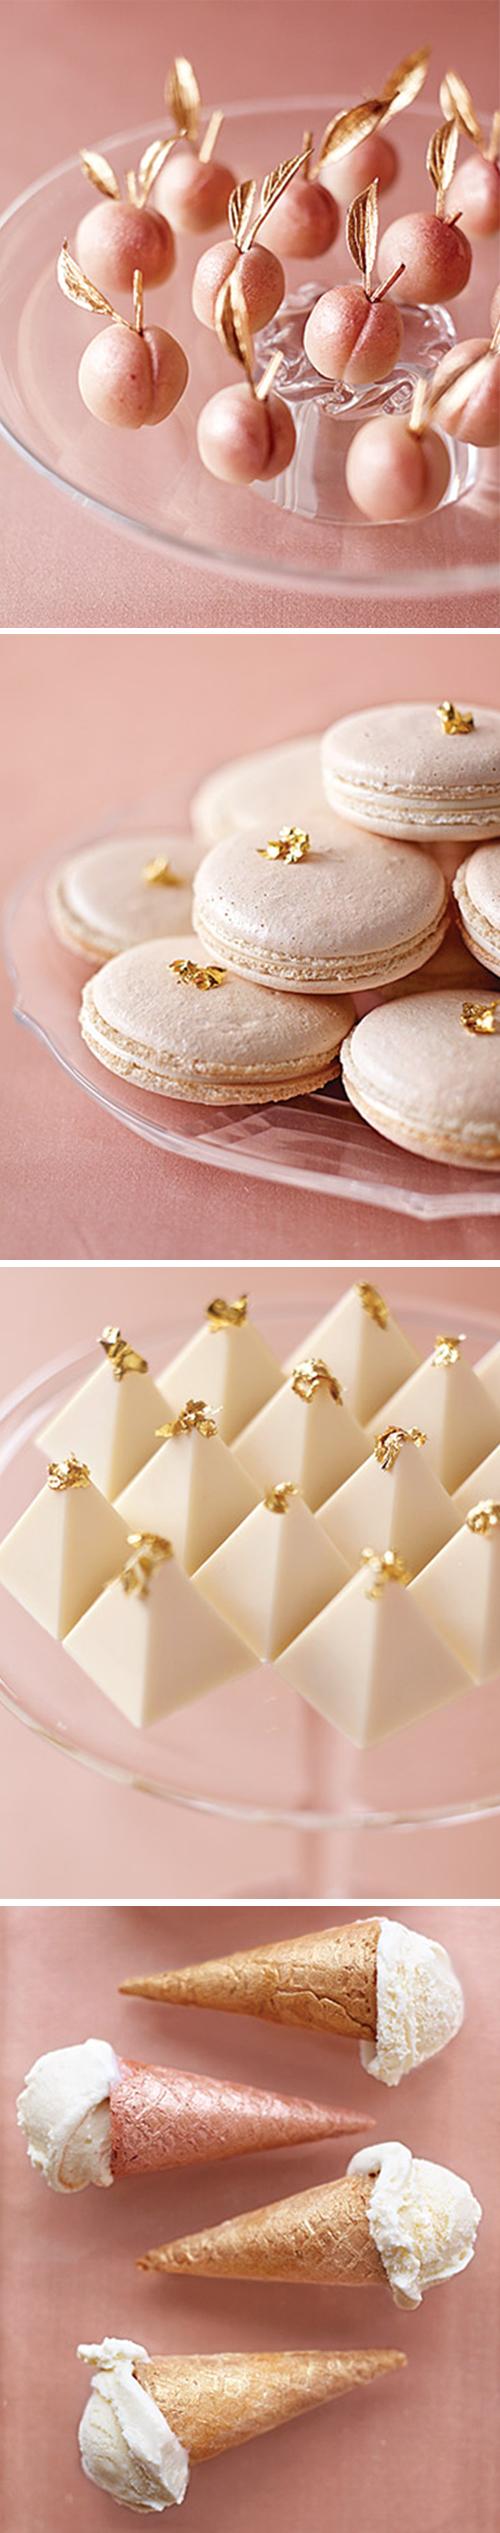 Inspiration-Desserts